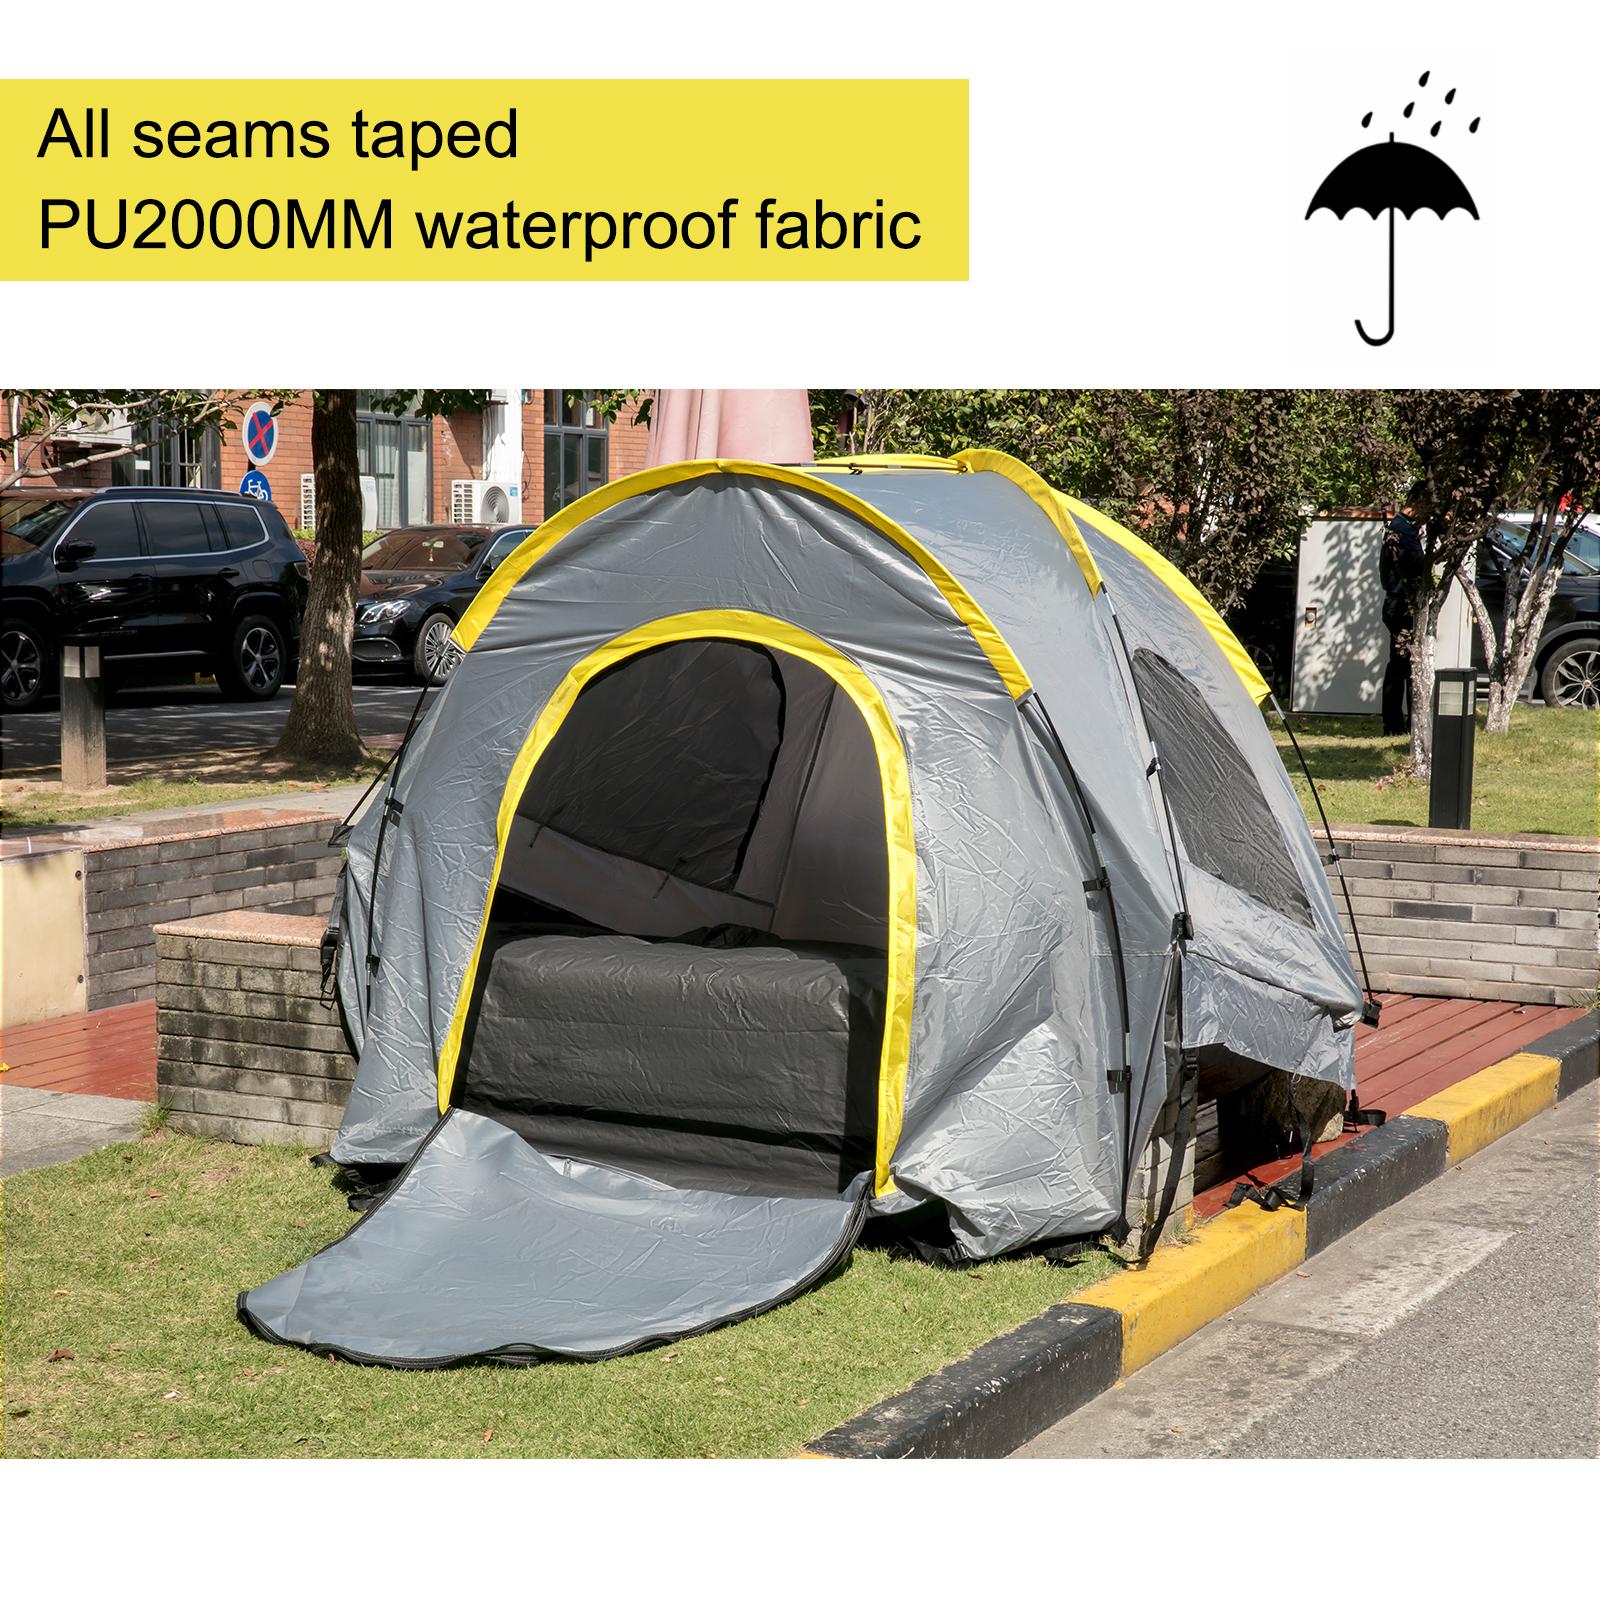 thumbnail 44 - VEVOR Truck Tent Truck Bed Tent 5' - 8' Pickup Tent Waterproof Outdoor Camping